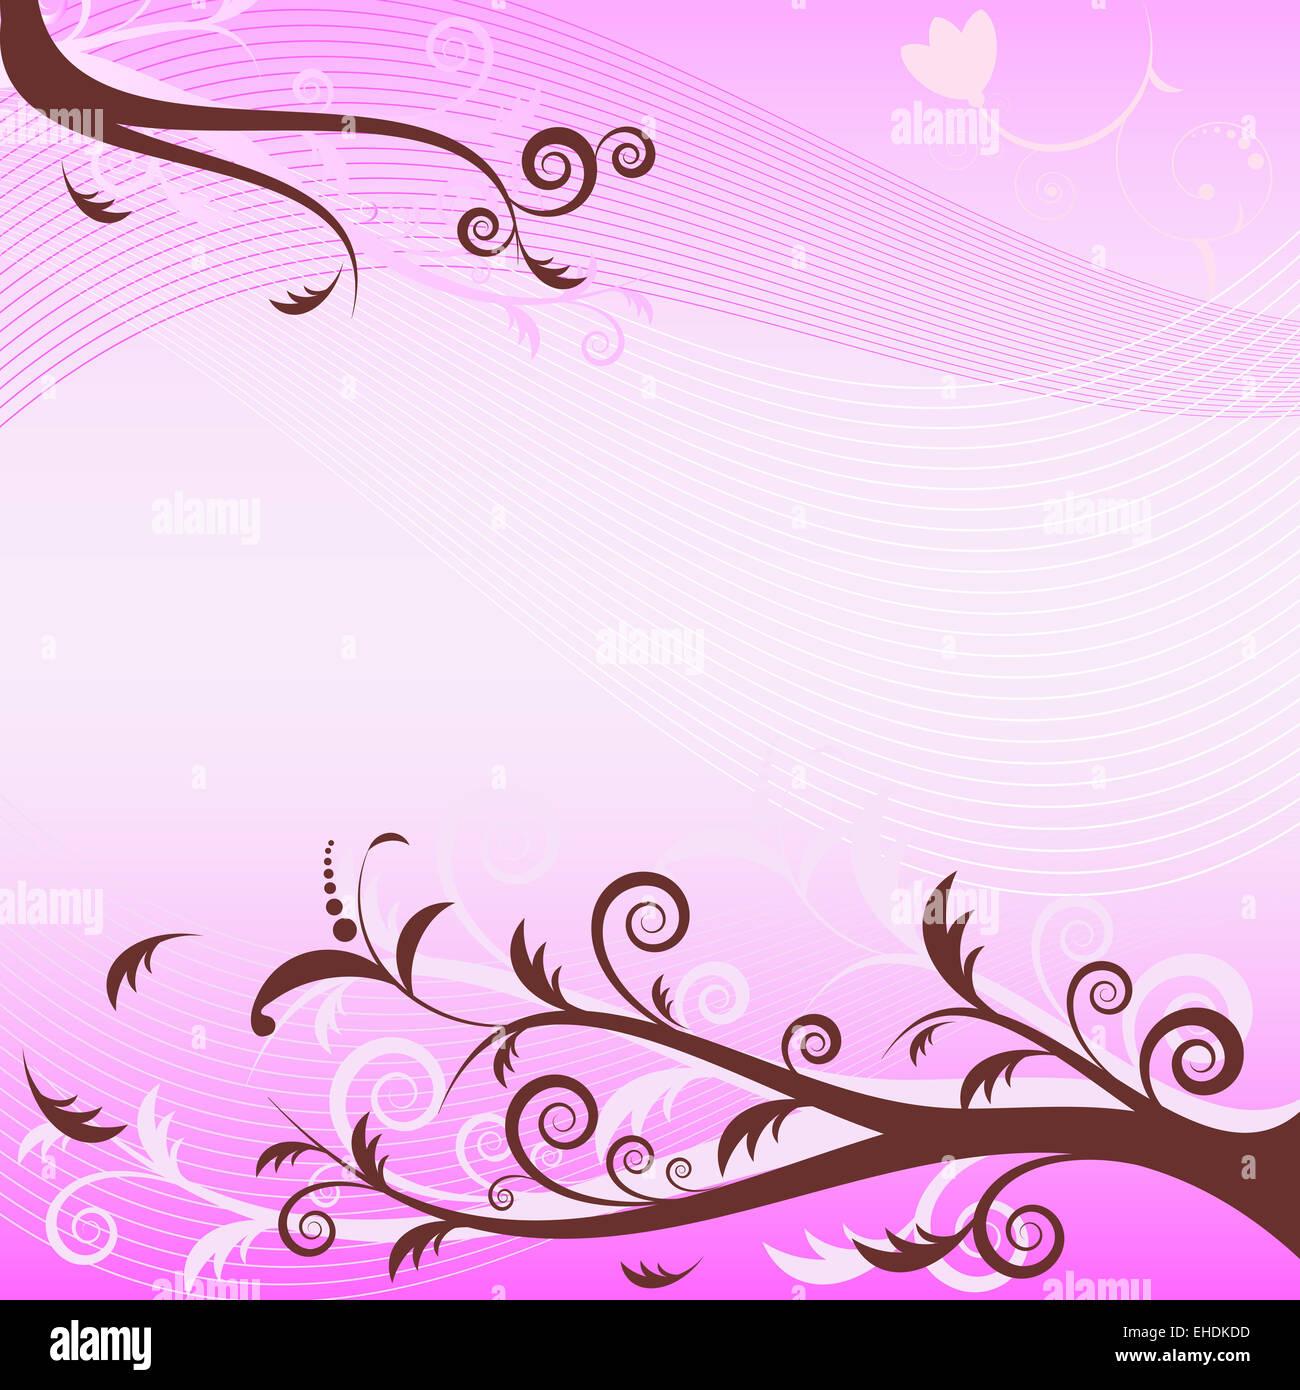 Gentle pink background - Stock Image